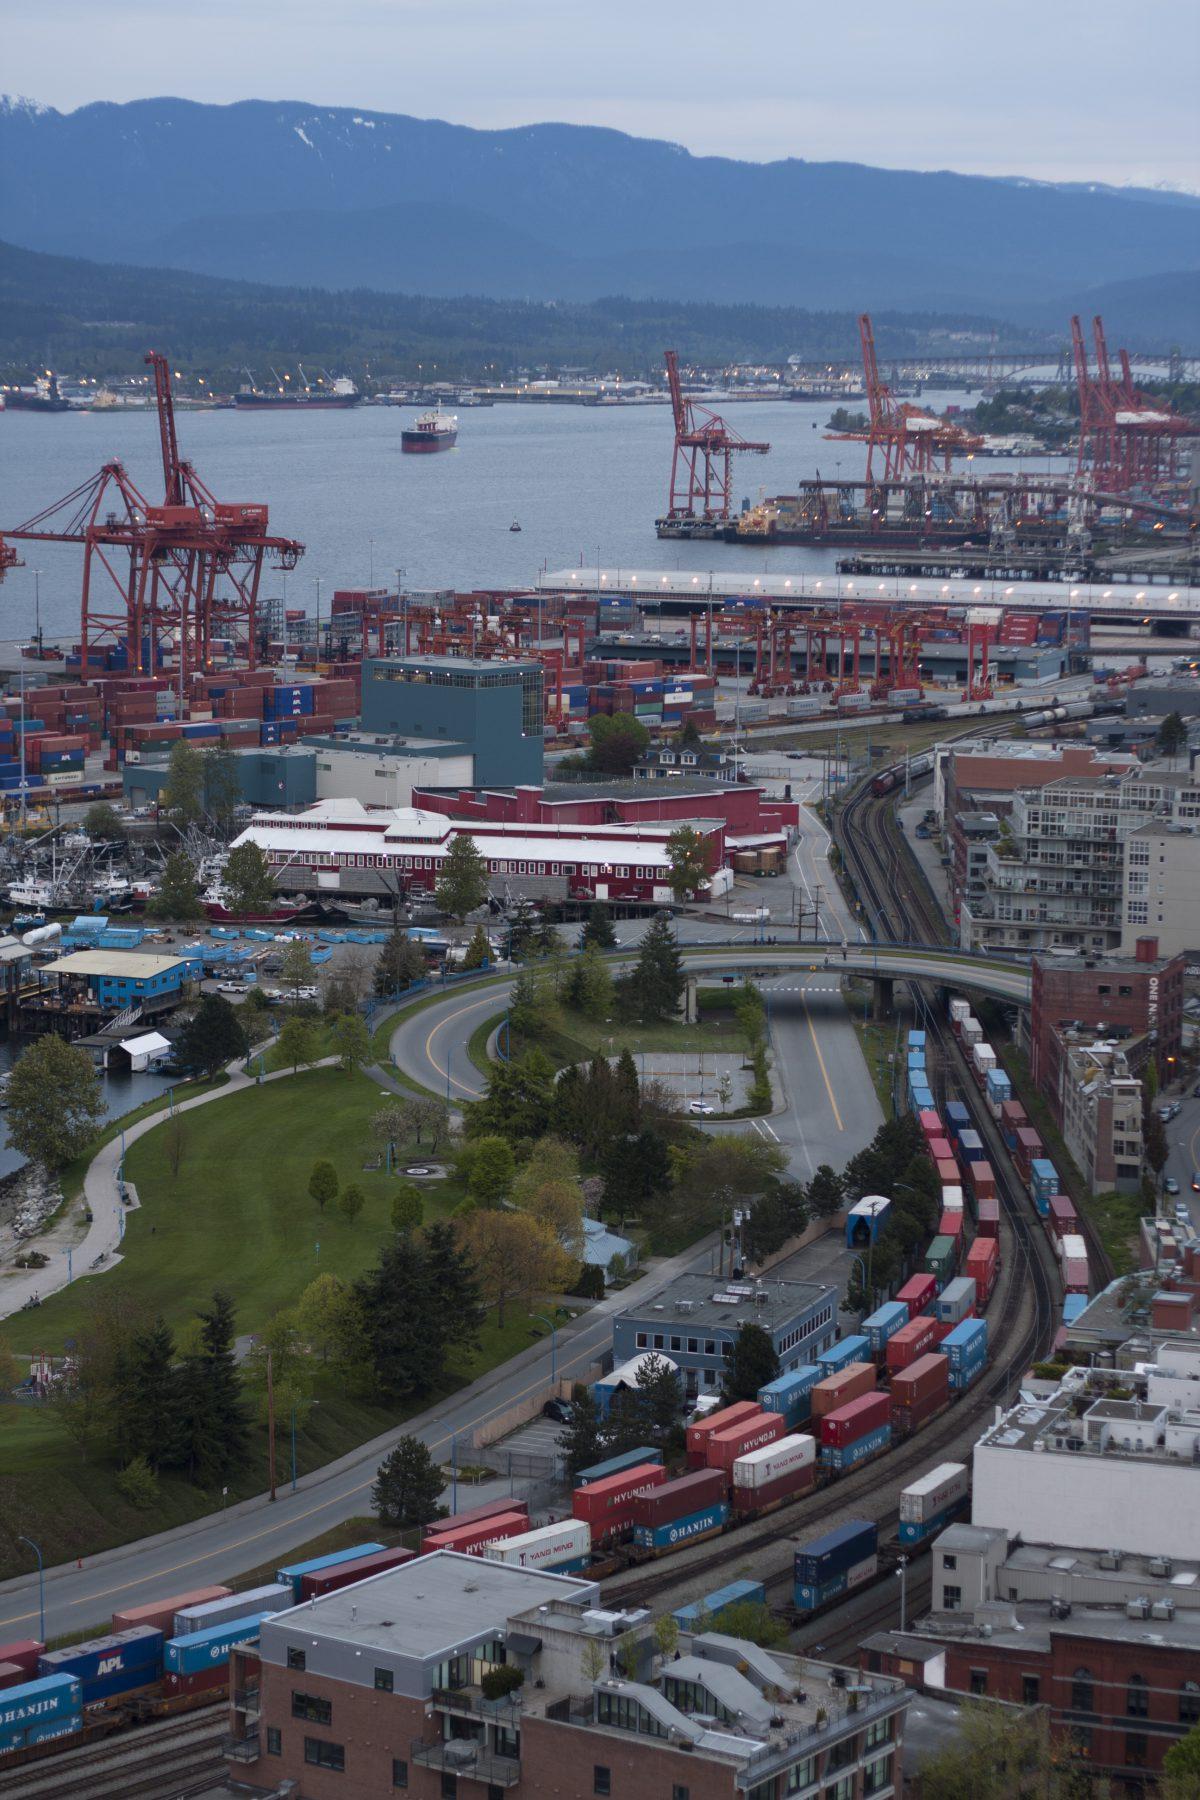 port, cargo, view, crane, train